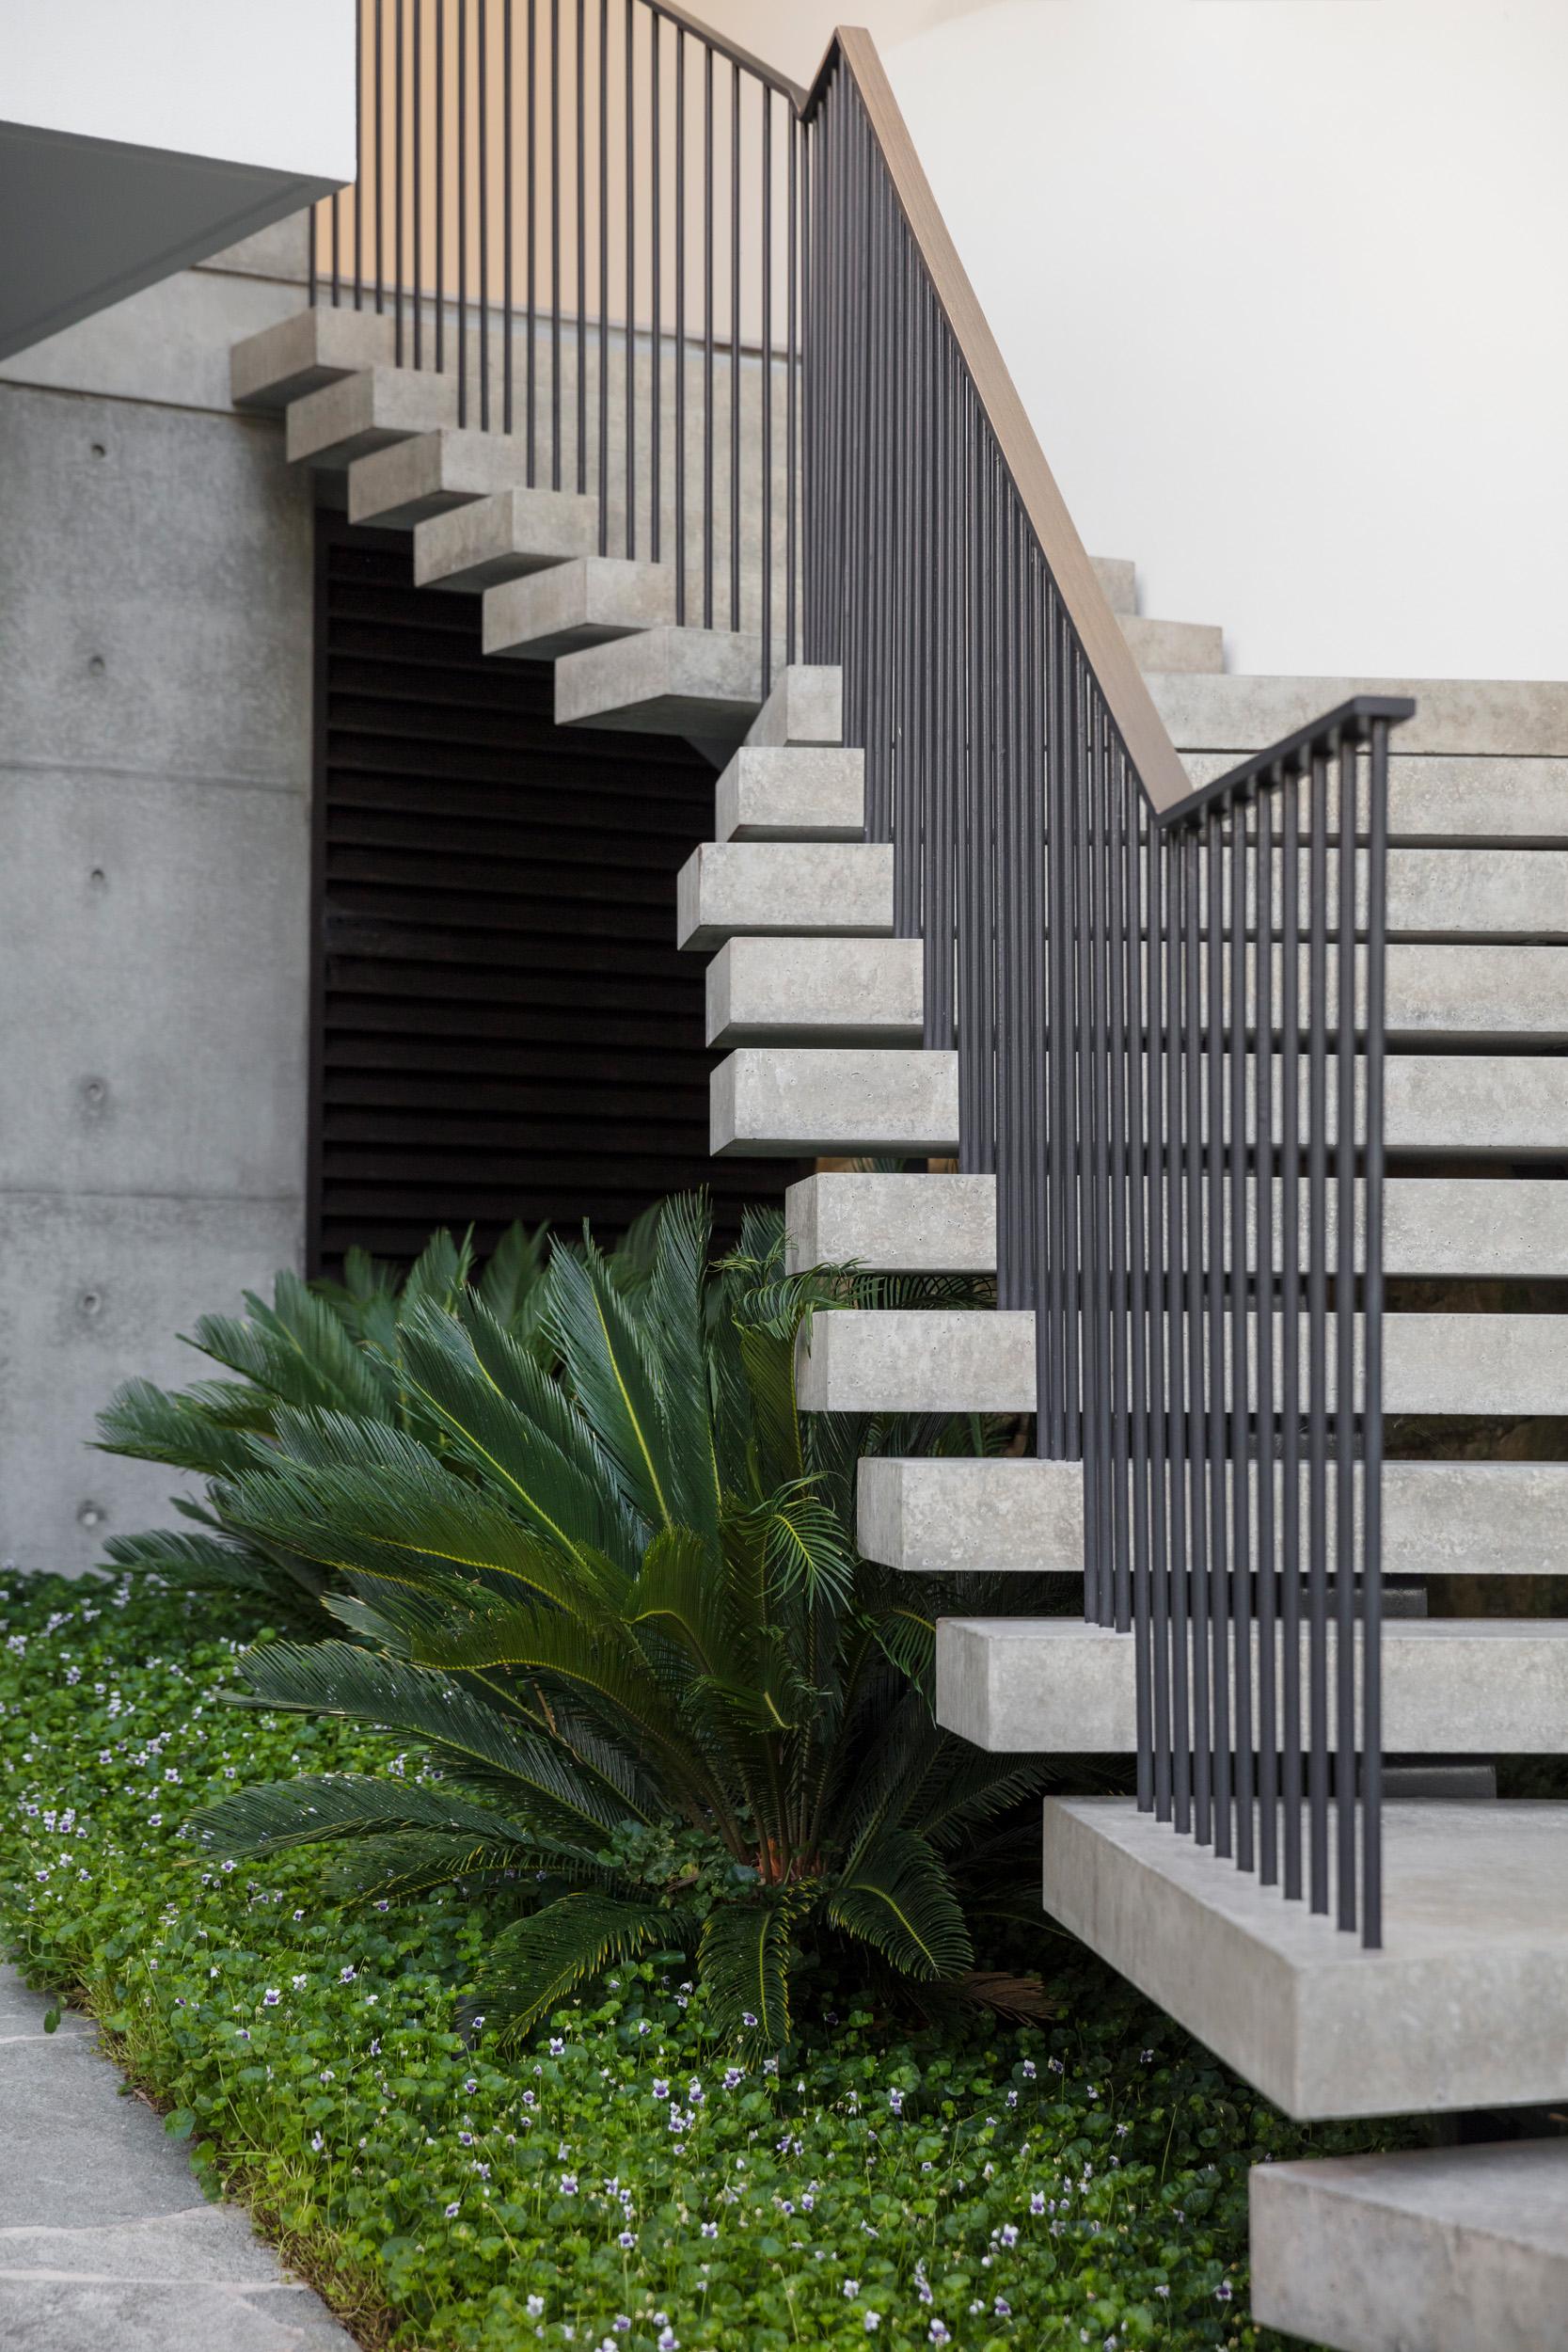 Jem_Cresswell_Architecture_Residential_Photographer_Sydney_Australia_034.jpg